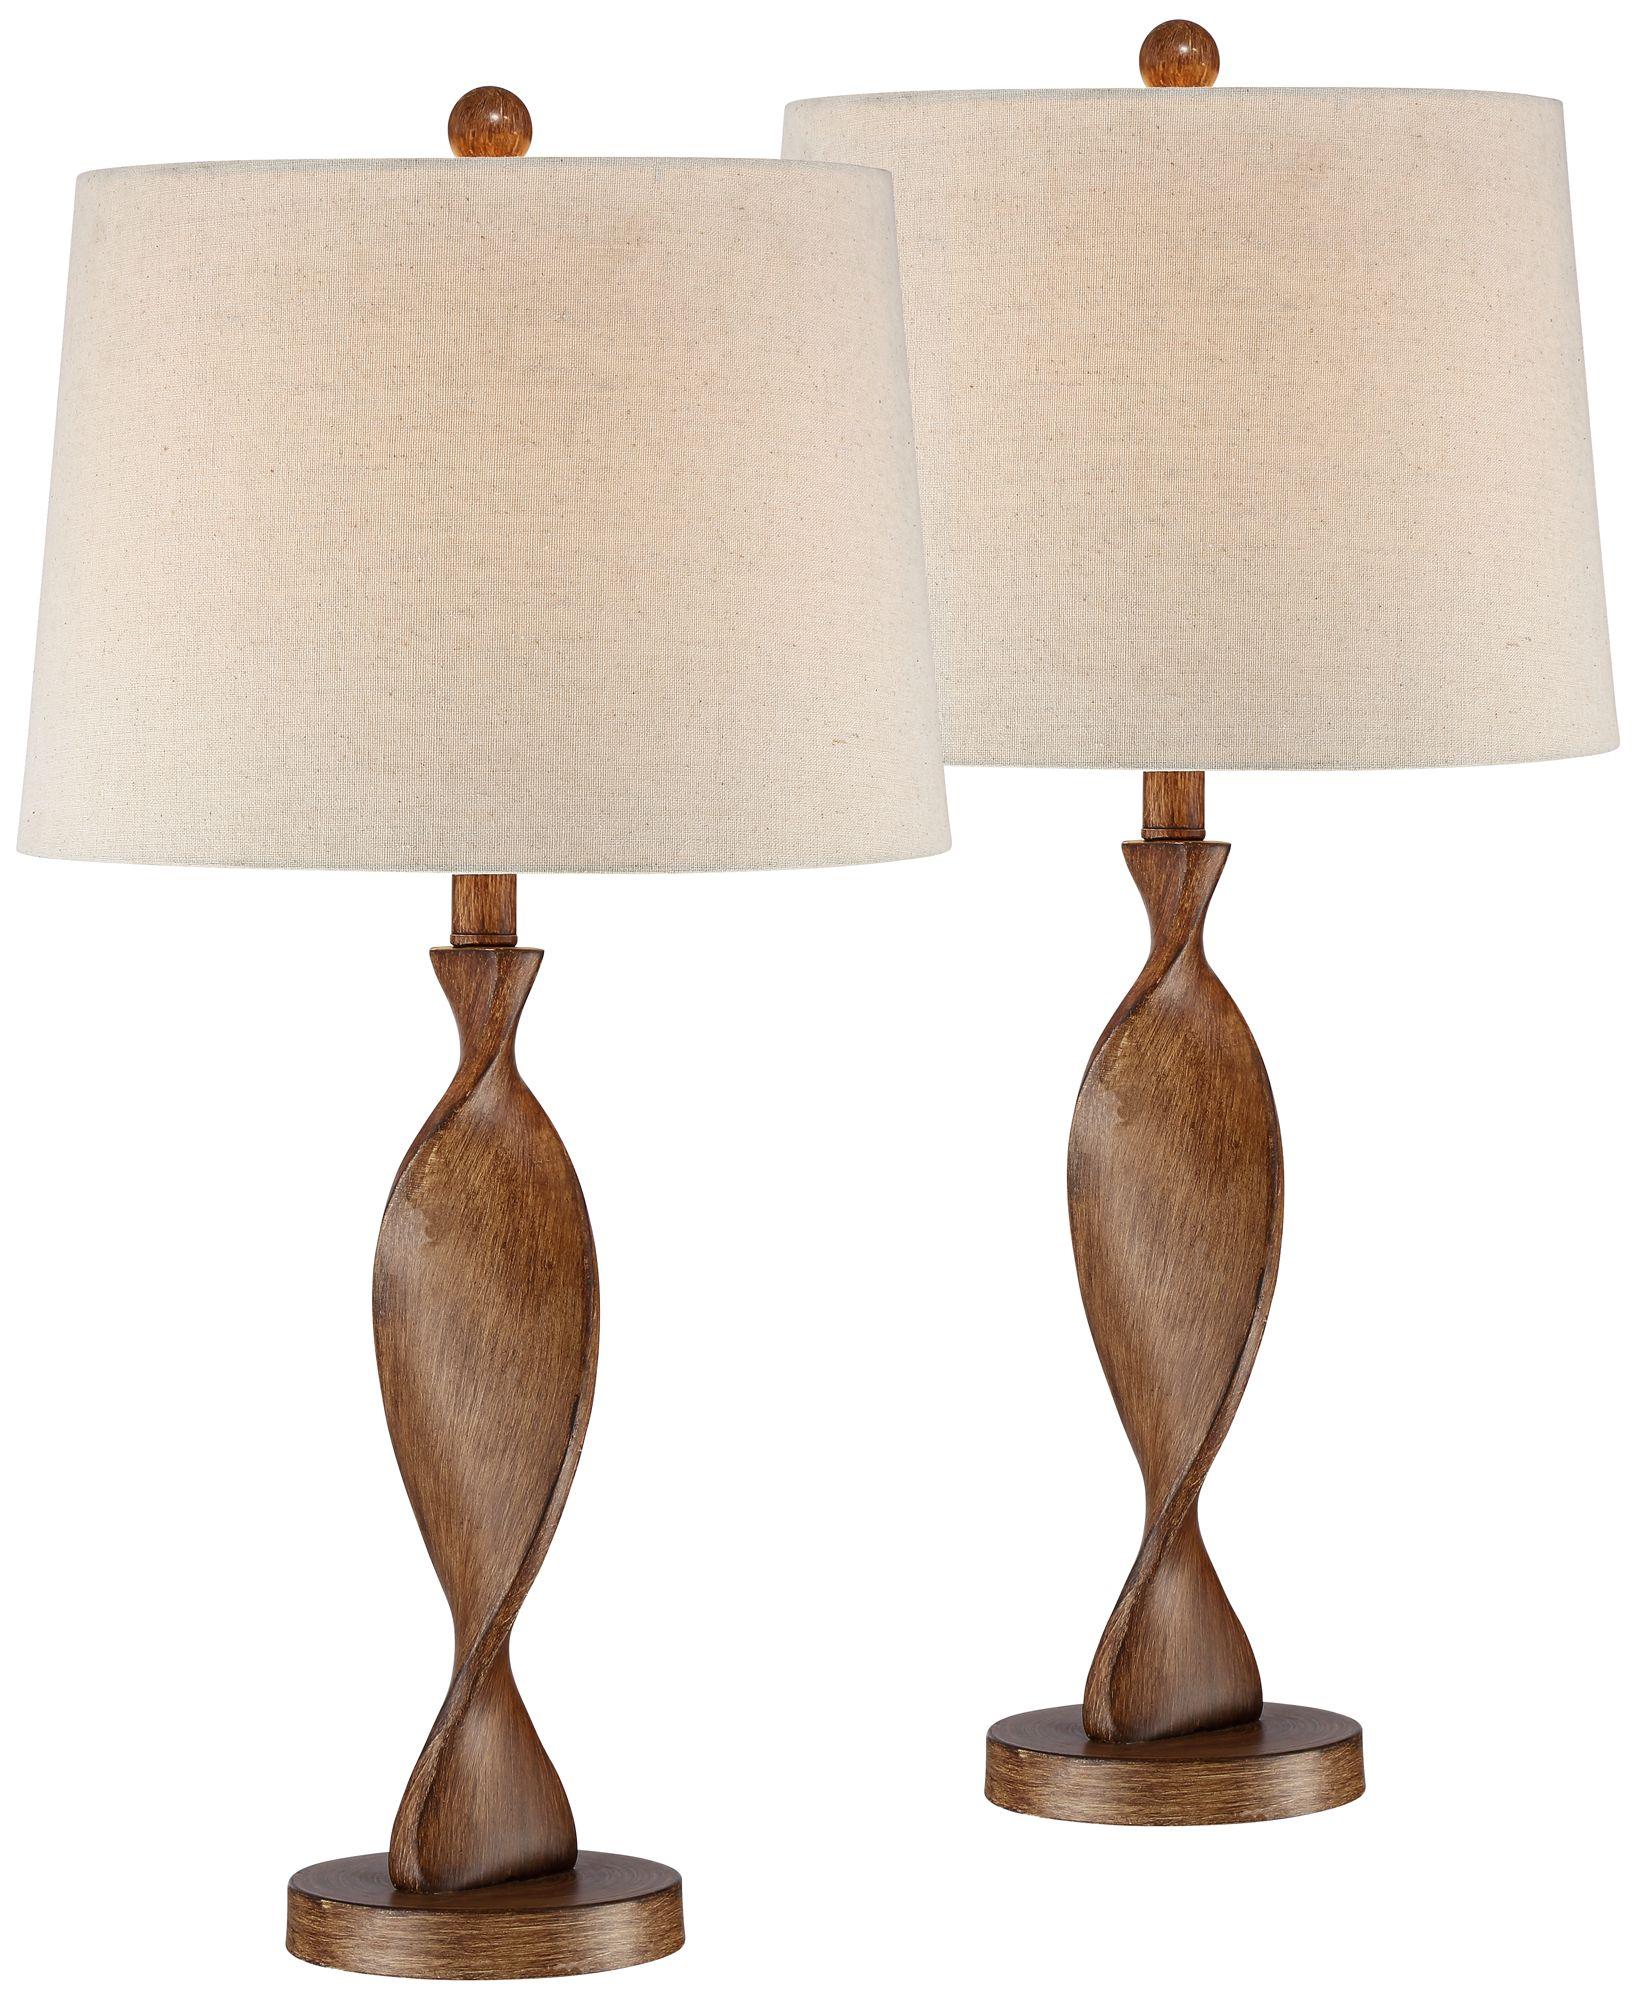 Charming Debra Modern Table Lamp Set Of 2